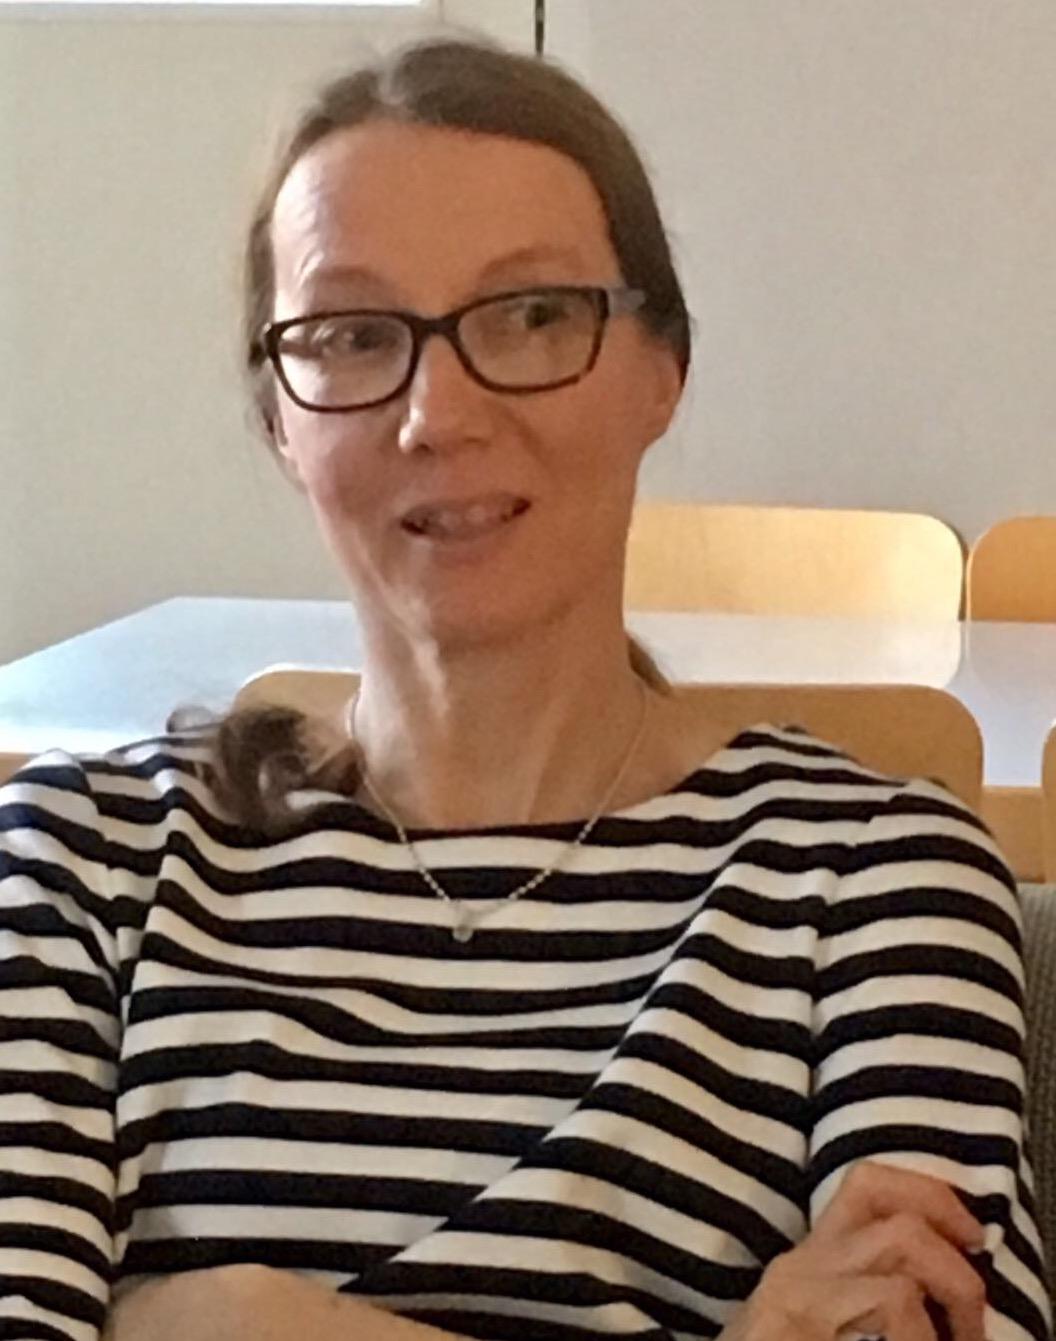 Titta Pirkola – University of Helsinki